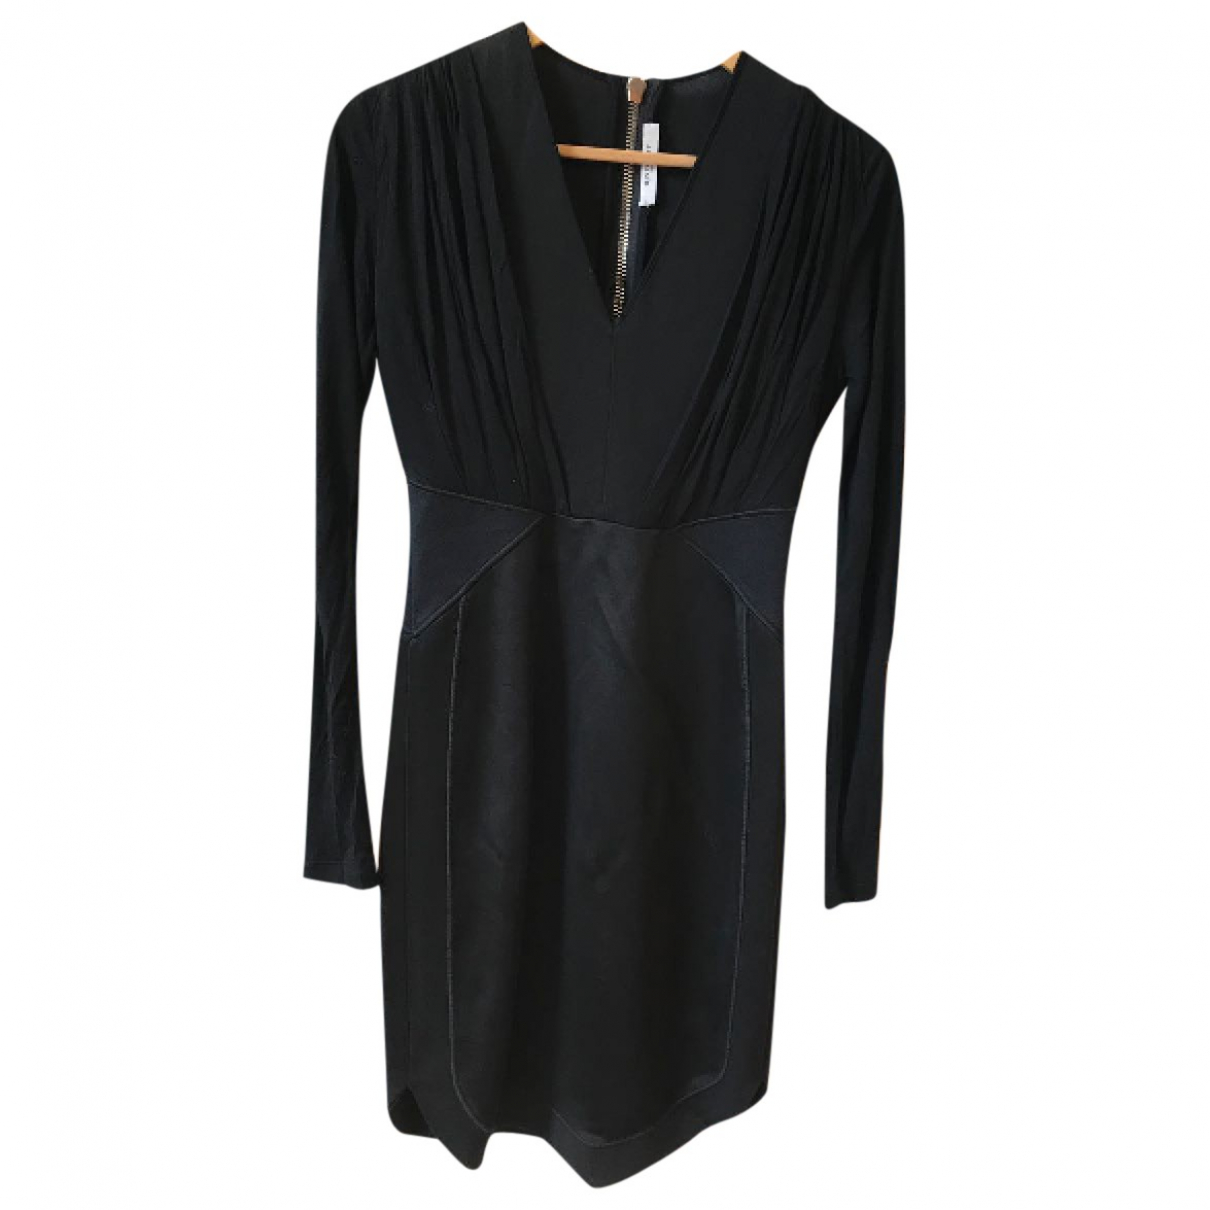 Givenchy \N Black dress for Women 38 FR